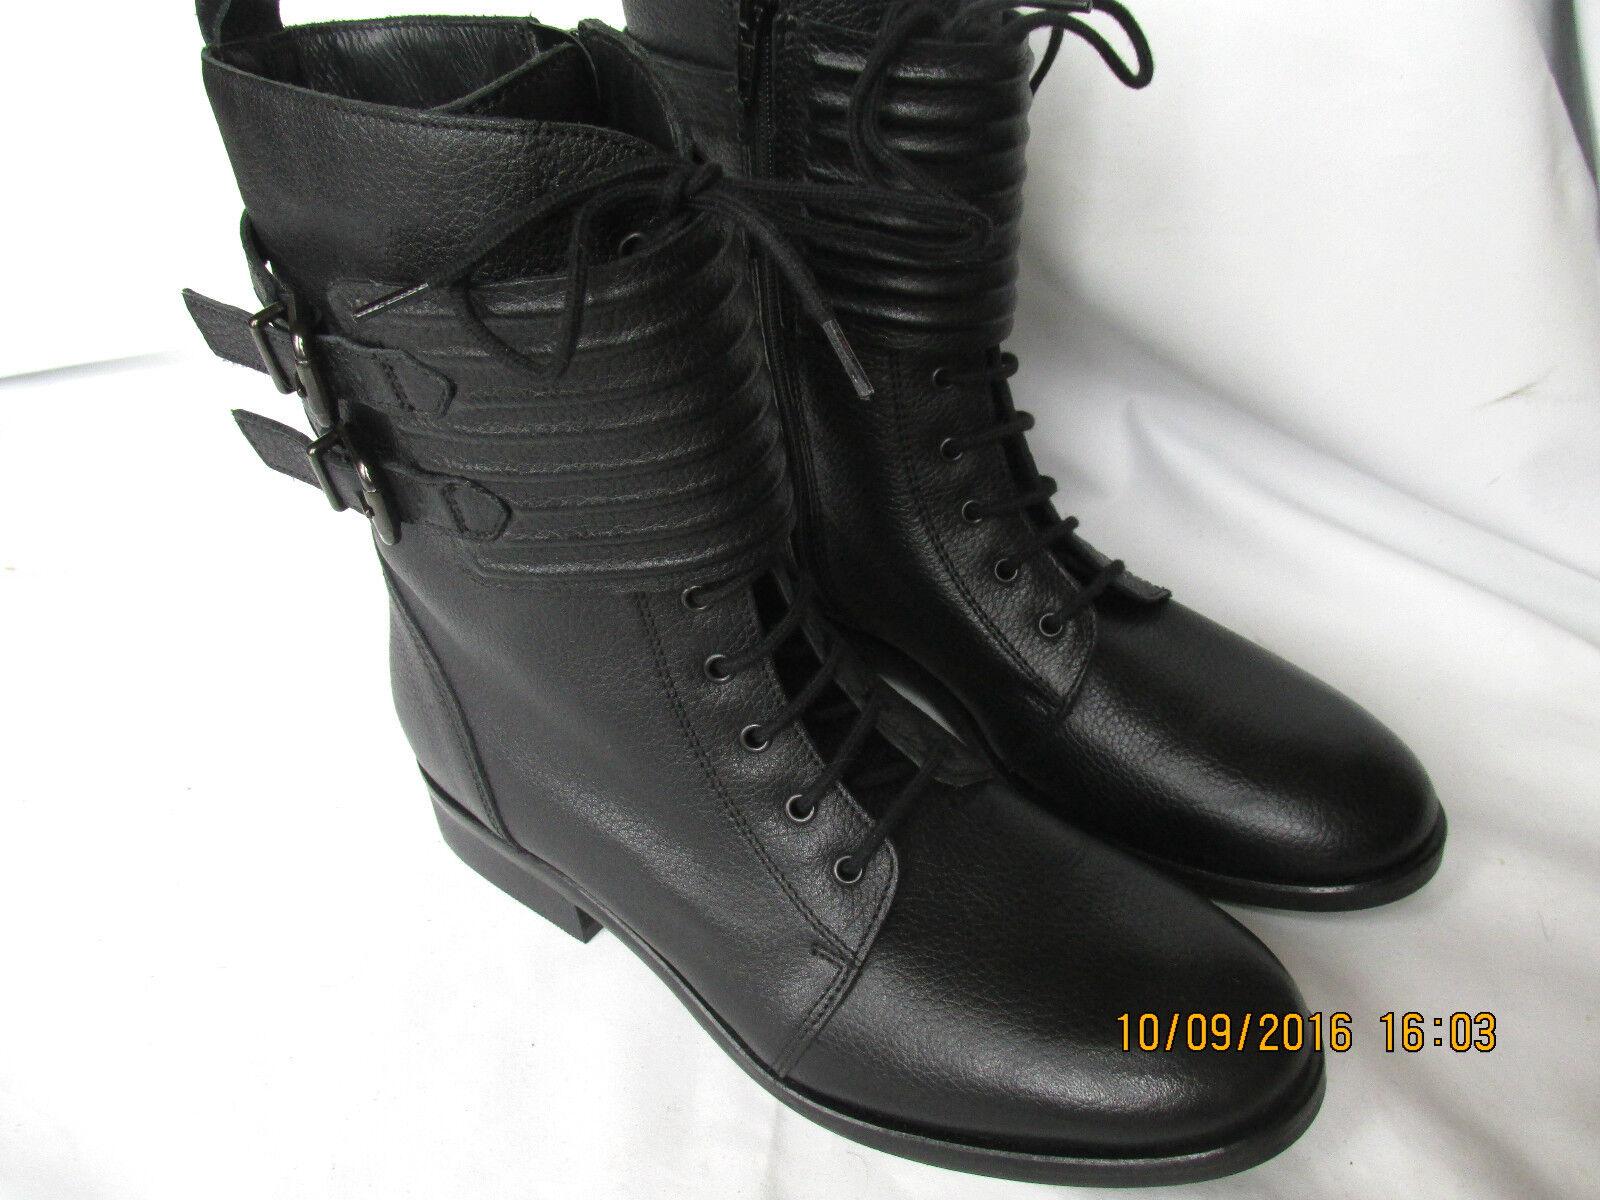 NEW Clarks Damenschuhe LANCE Leder Ankle Stiefel BLACK MINSTER LANCE Damenschuhe Lace Up Buckle 73d376